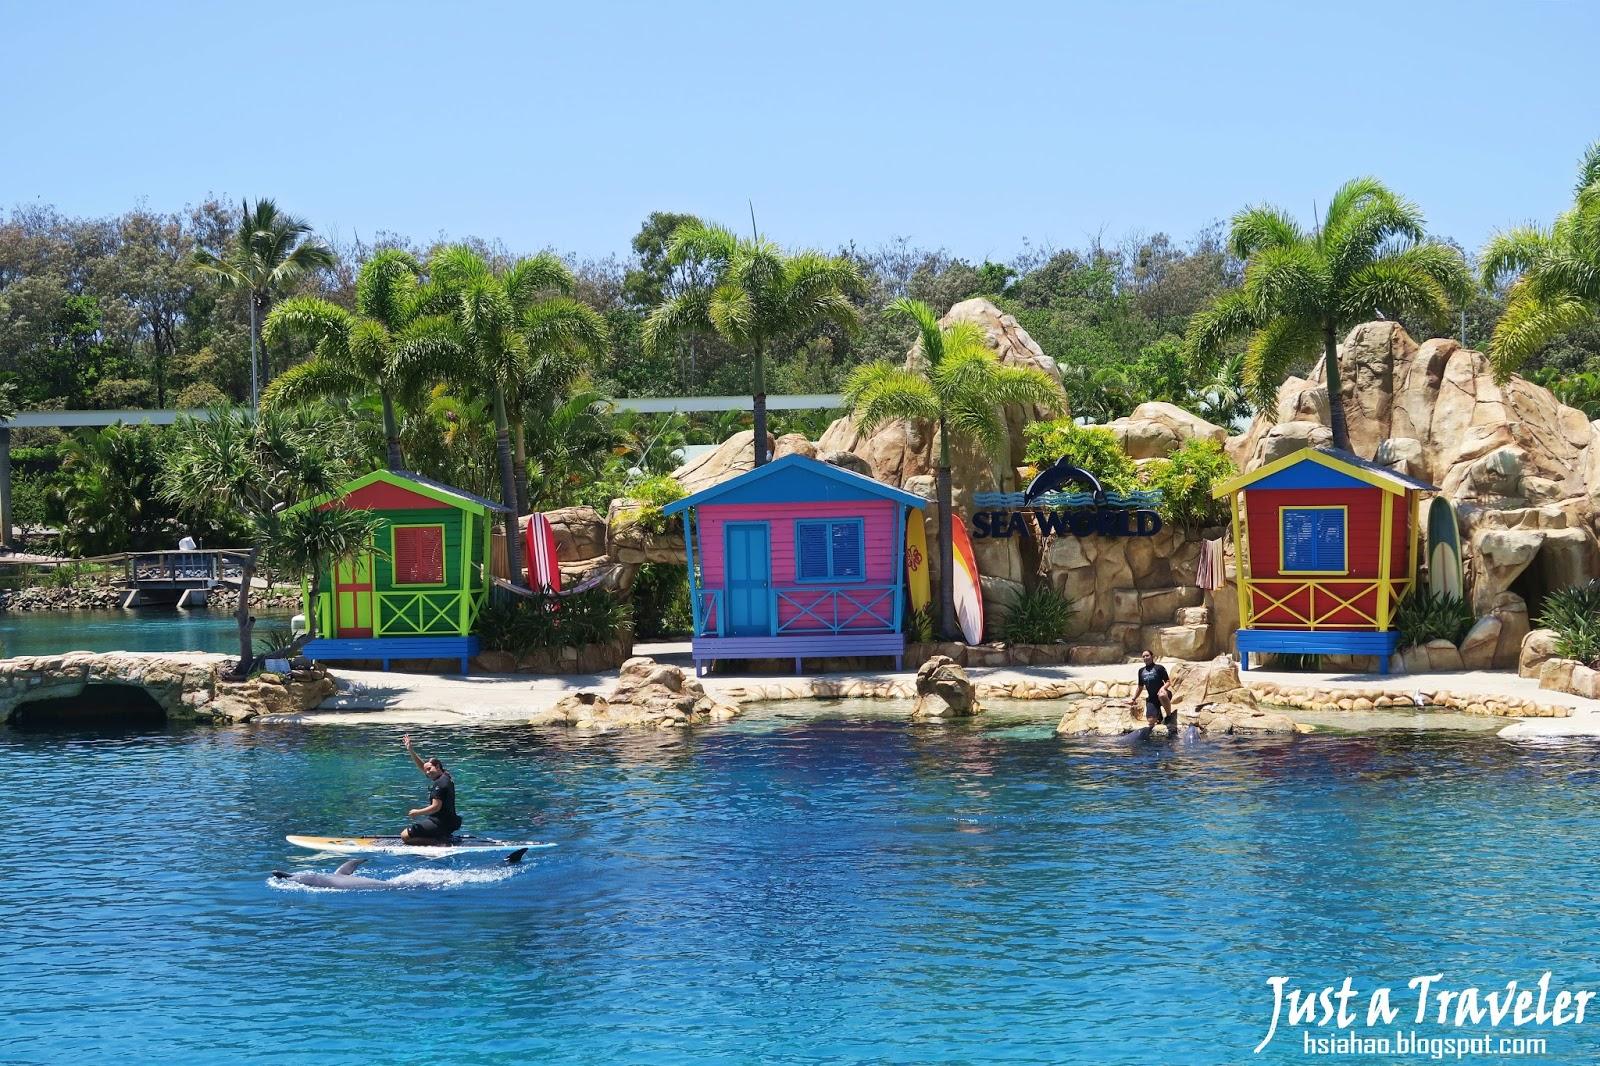 黃金海岸-景點-推薦-海洋世界-Gold-Coast-Attraction-Sea-World-Tourist-destination